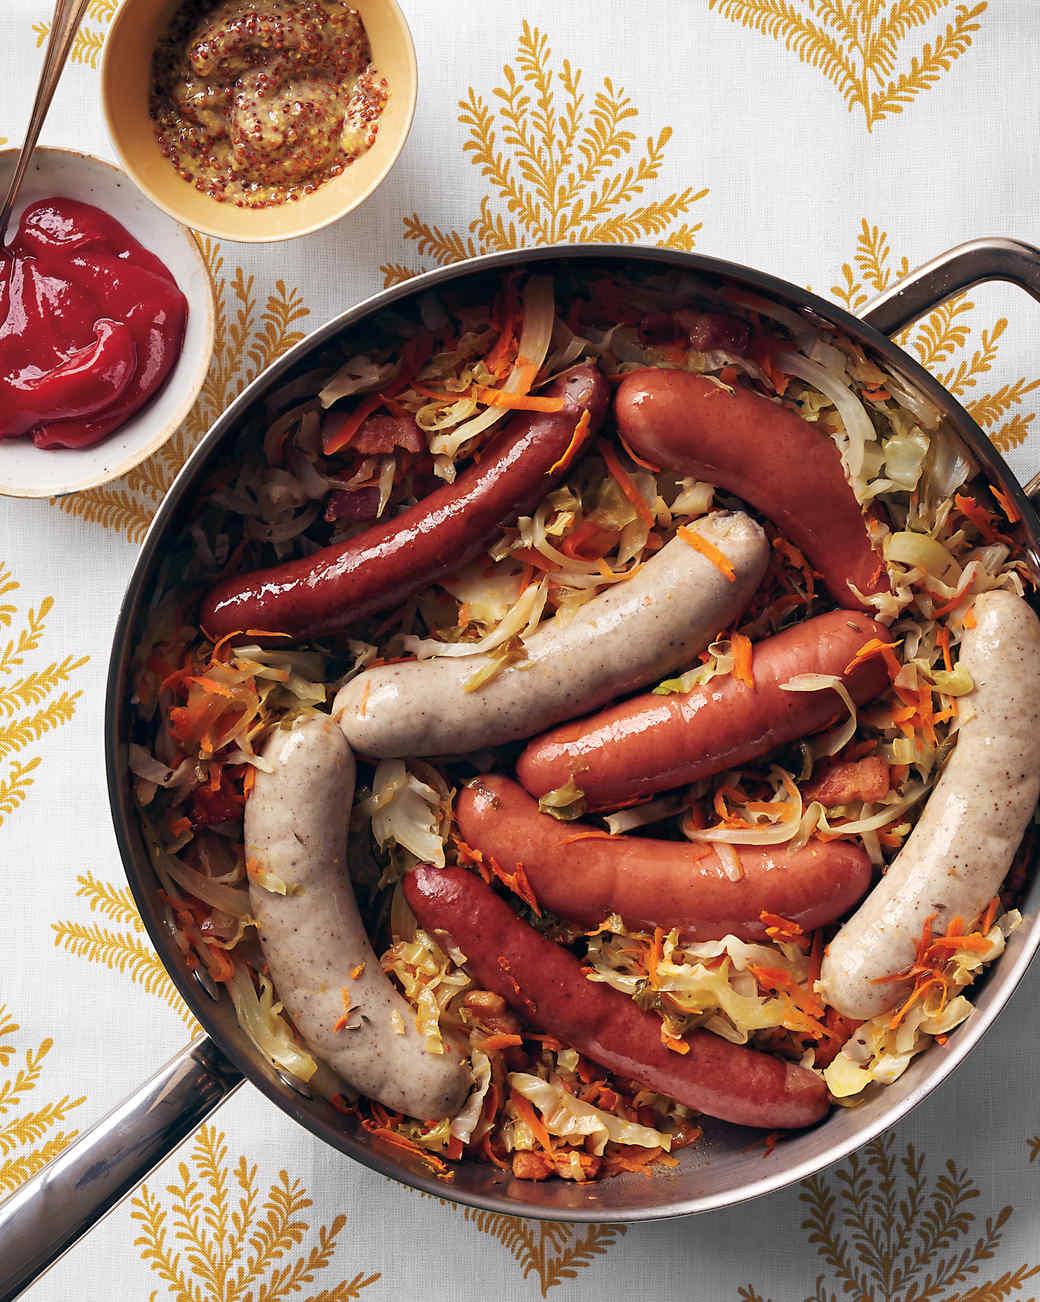 sausage-with-sauerkraut-and-bacon-066-d112221.jpg